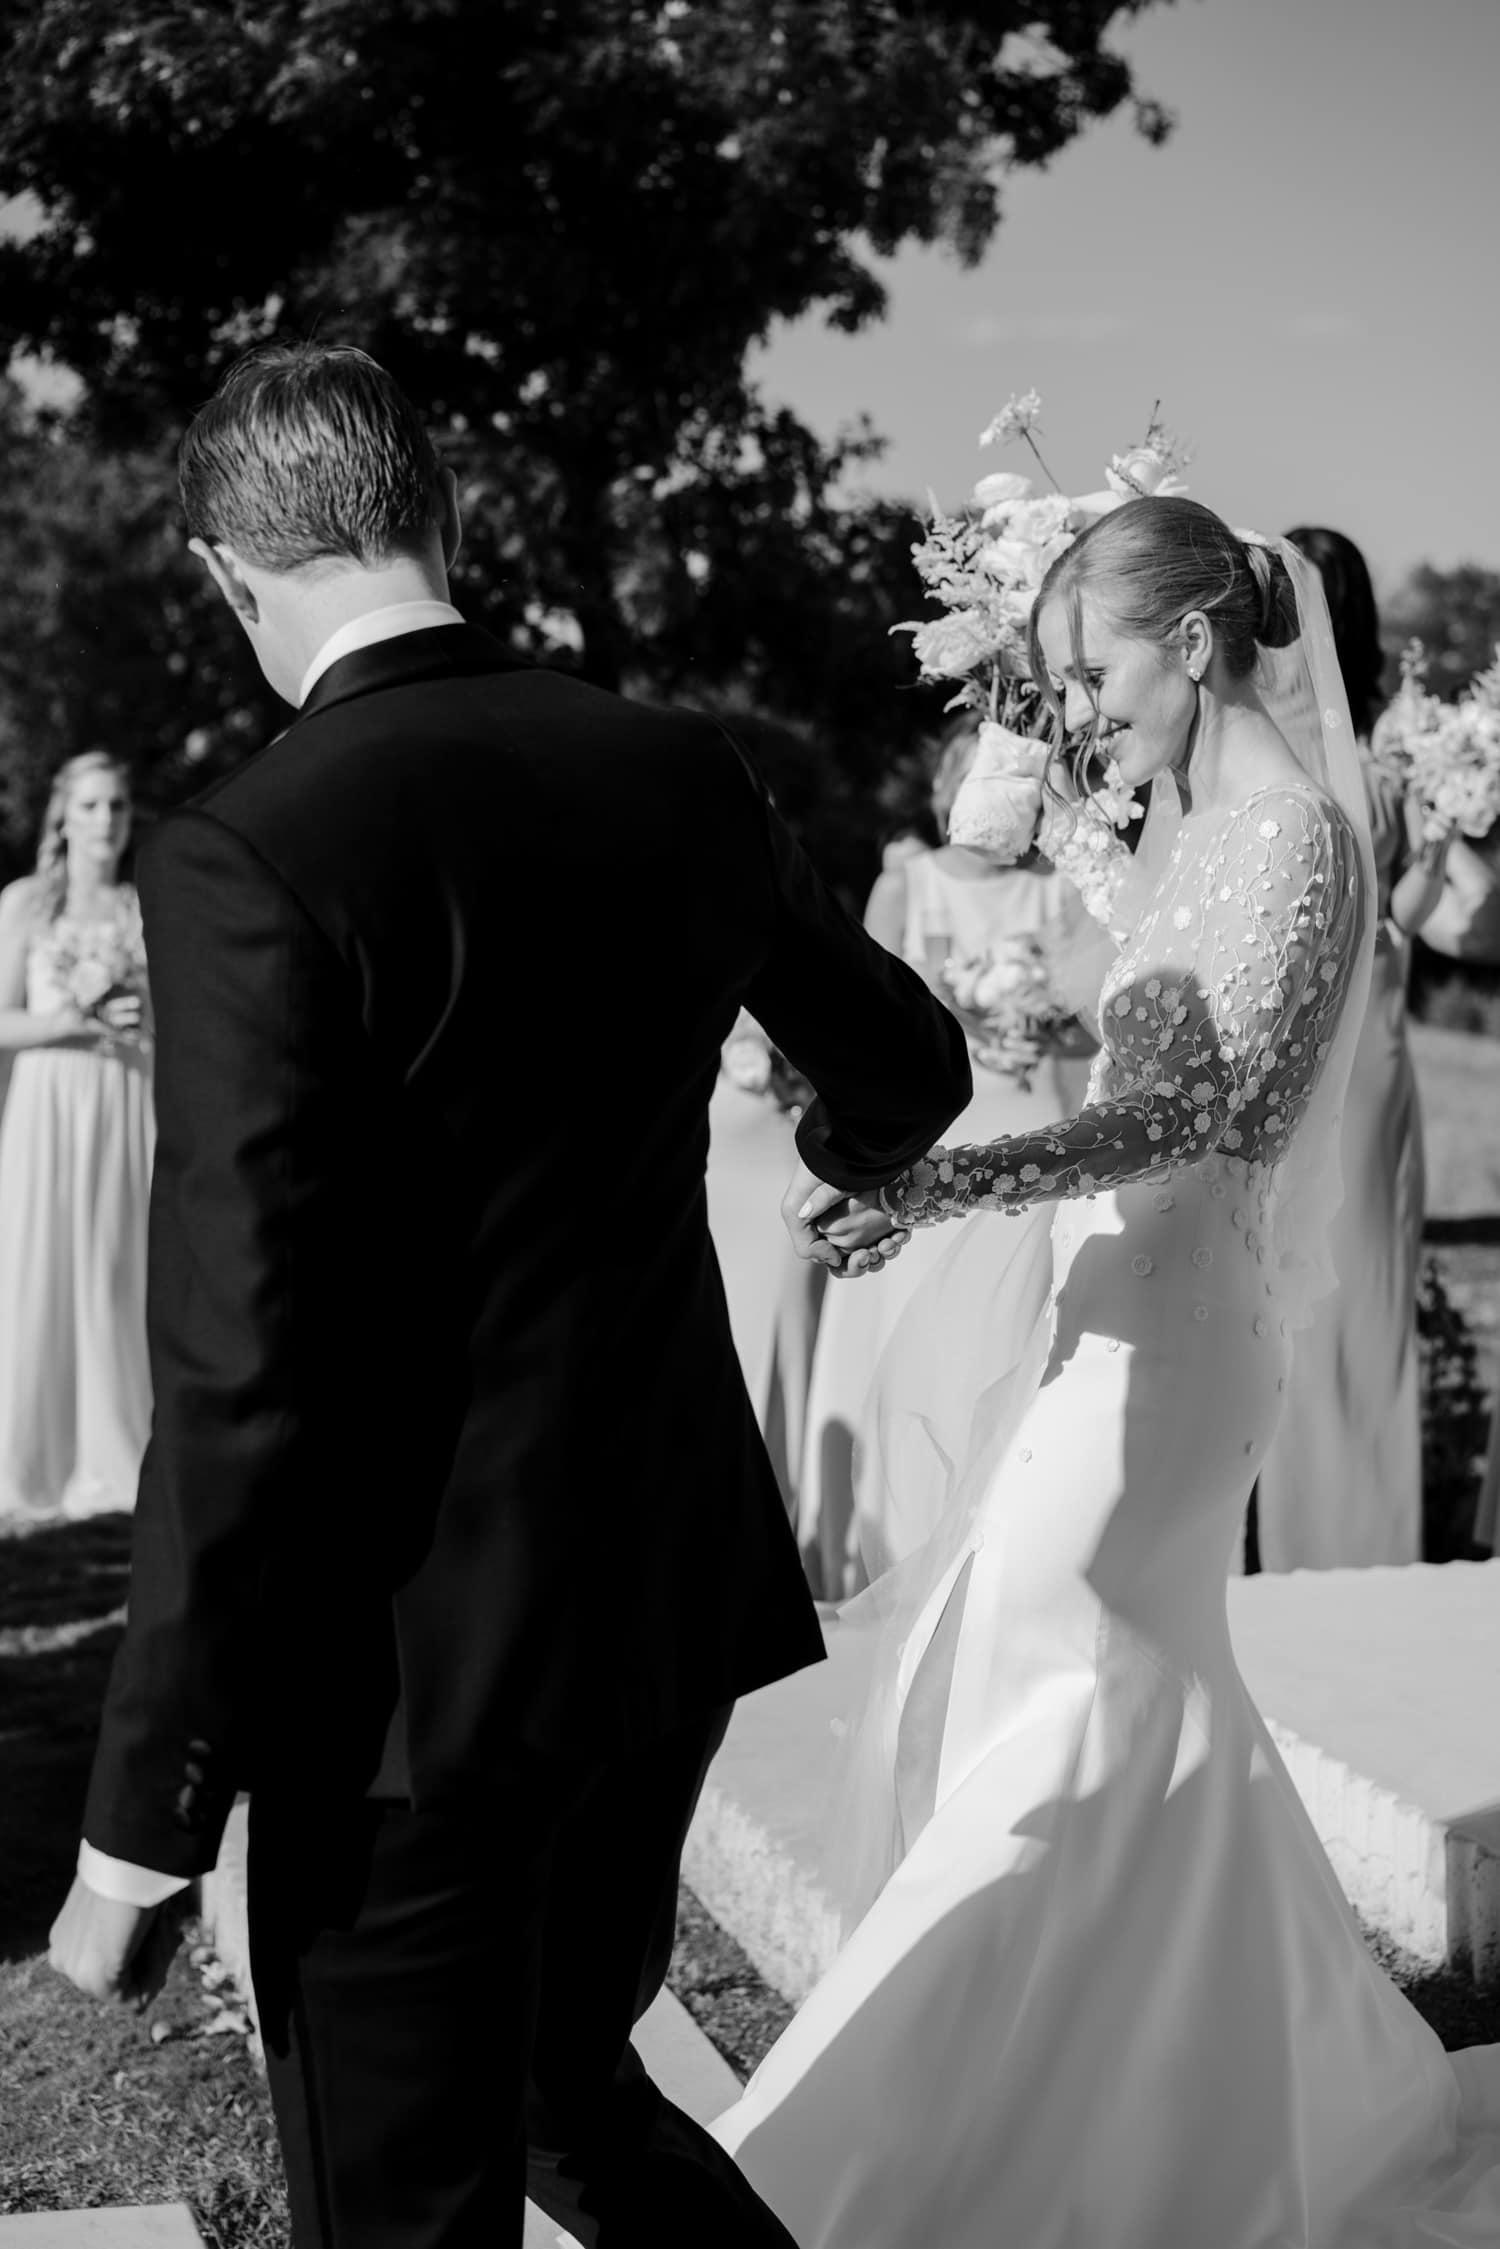 PROSPECT_HOUSE_WEDDING_AUSTIN_TX_MATTHEW_MOORE-00543.jpg